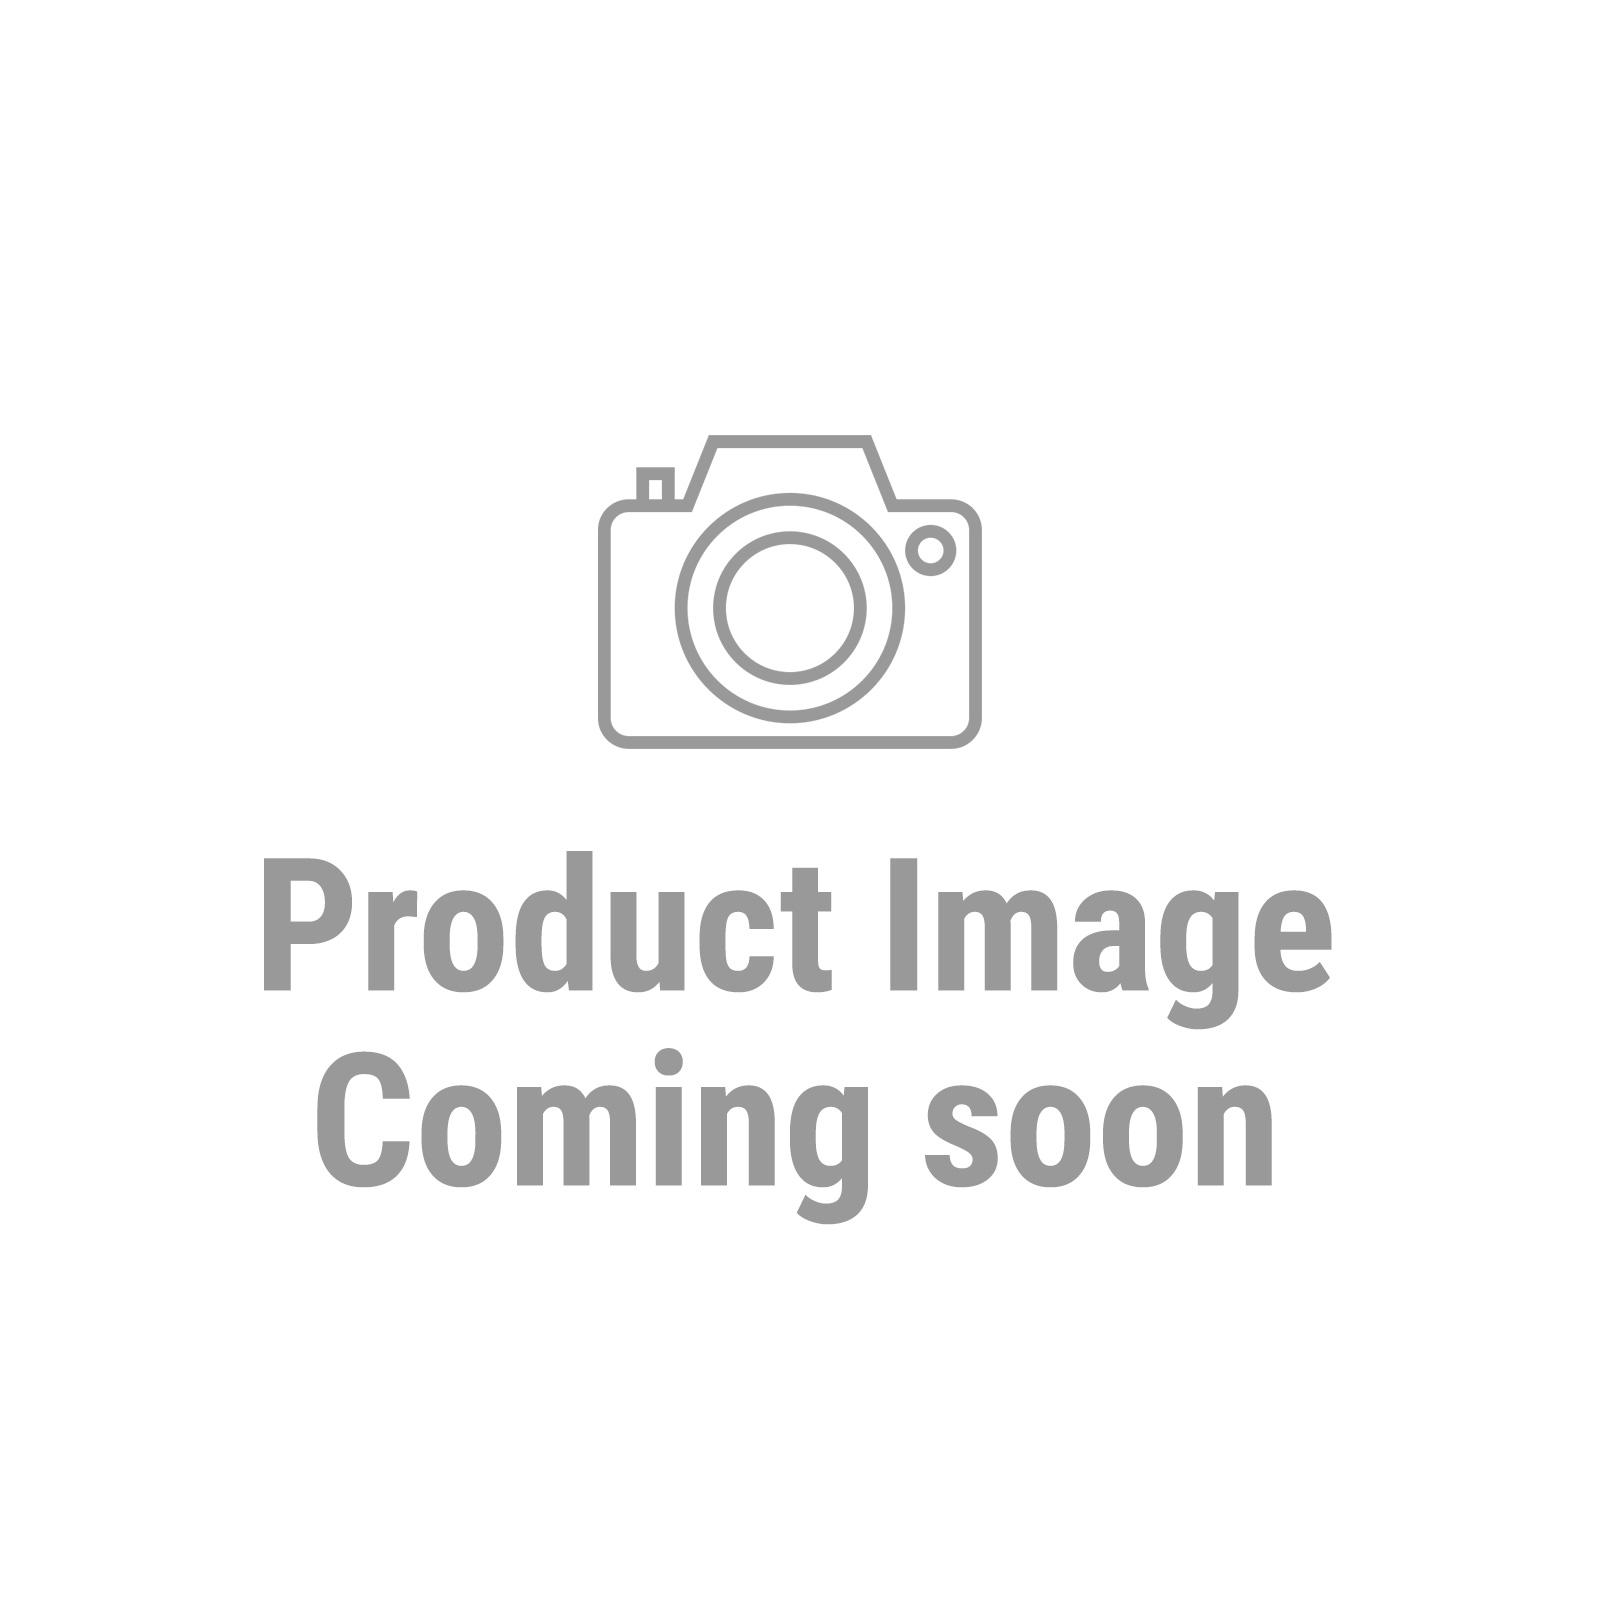 deiwo® Deichselhaube grau XL extra starkes PVC Kunstleder 58x88cm inkl Expander